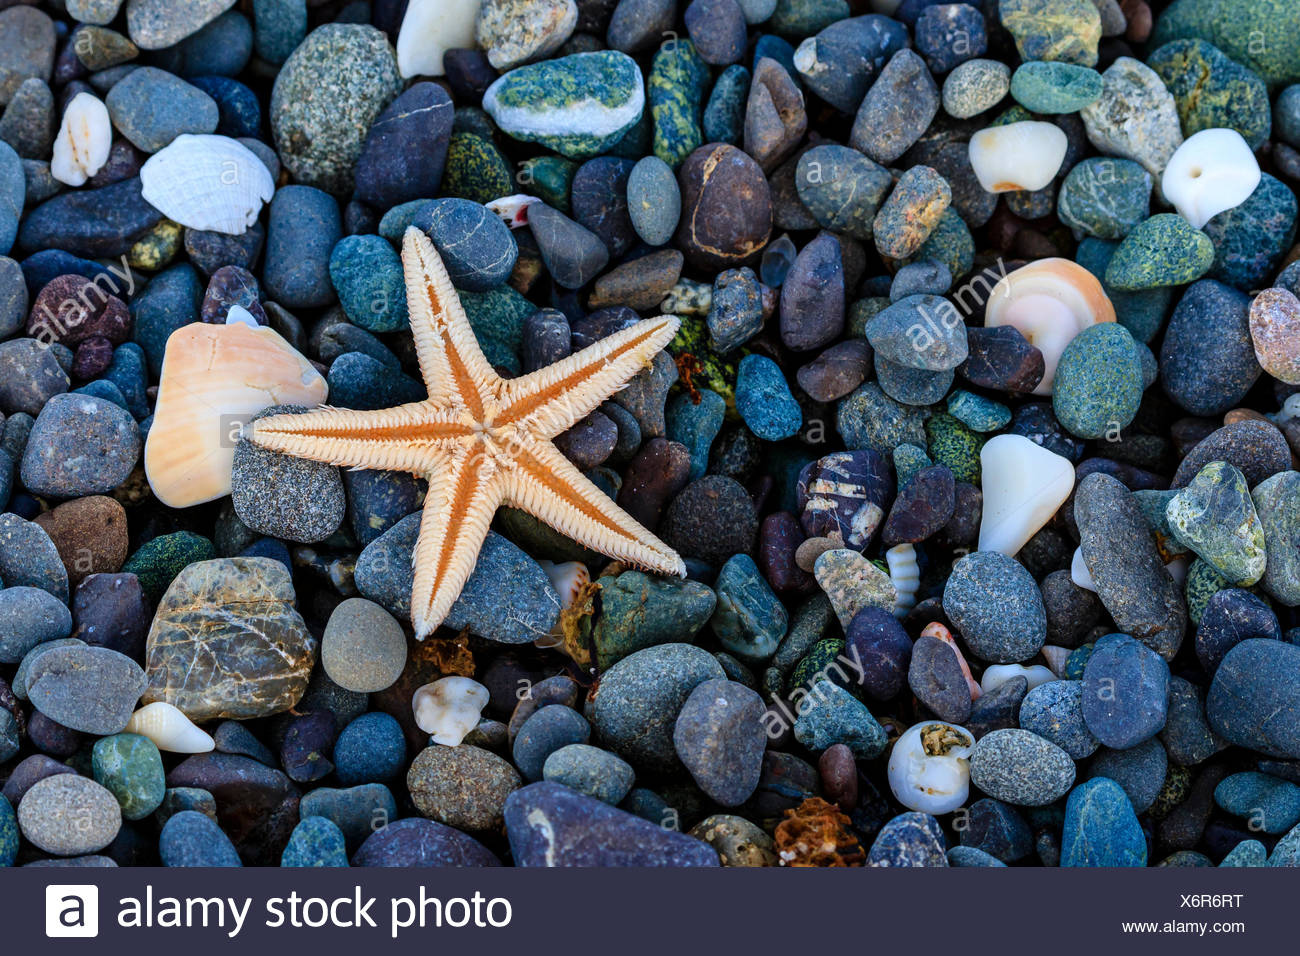 Sea star on colorful beach rocks. Stock Photo